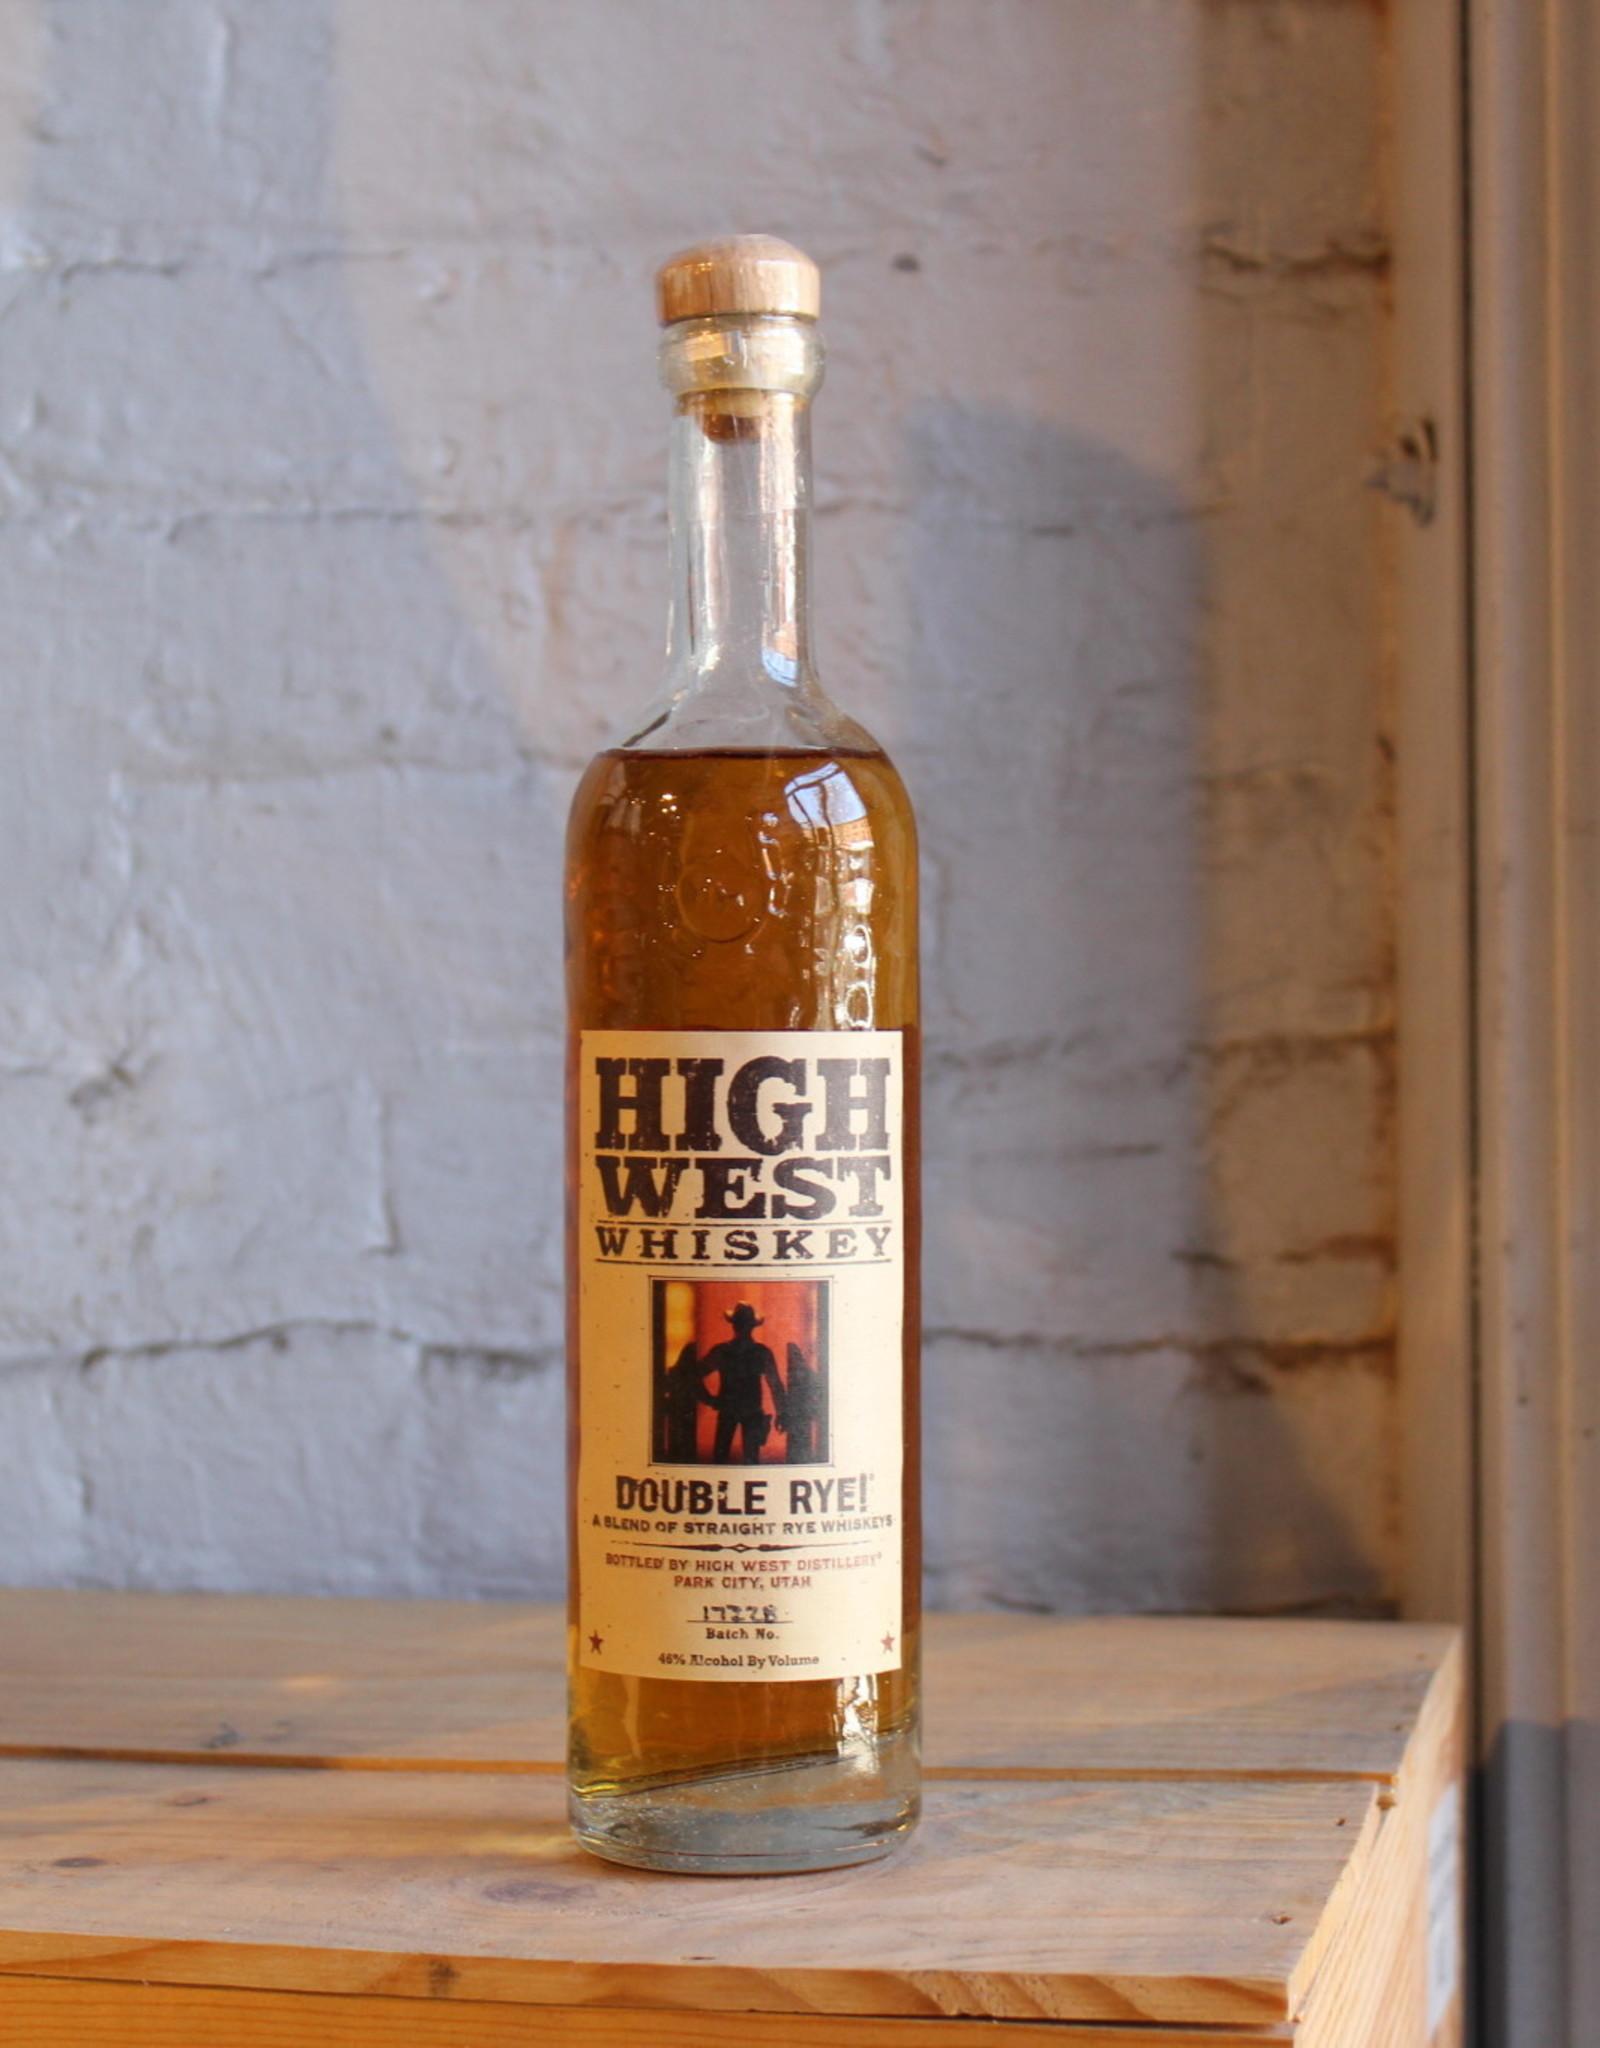 High West Double Rye Whiskey - Park City, UT (375ml)